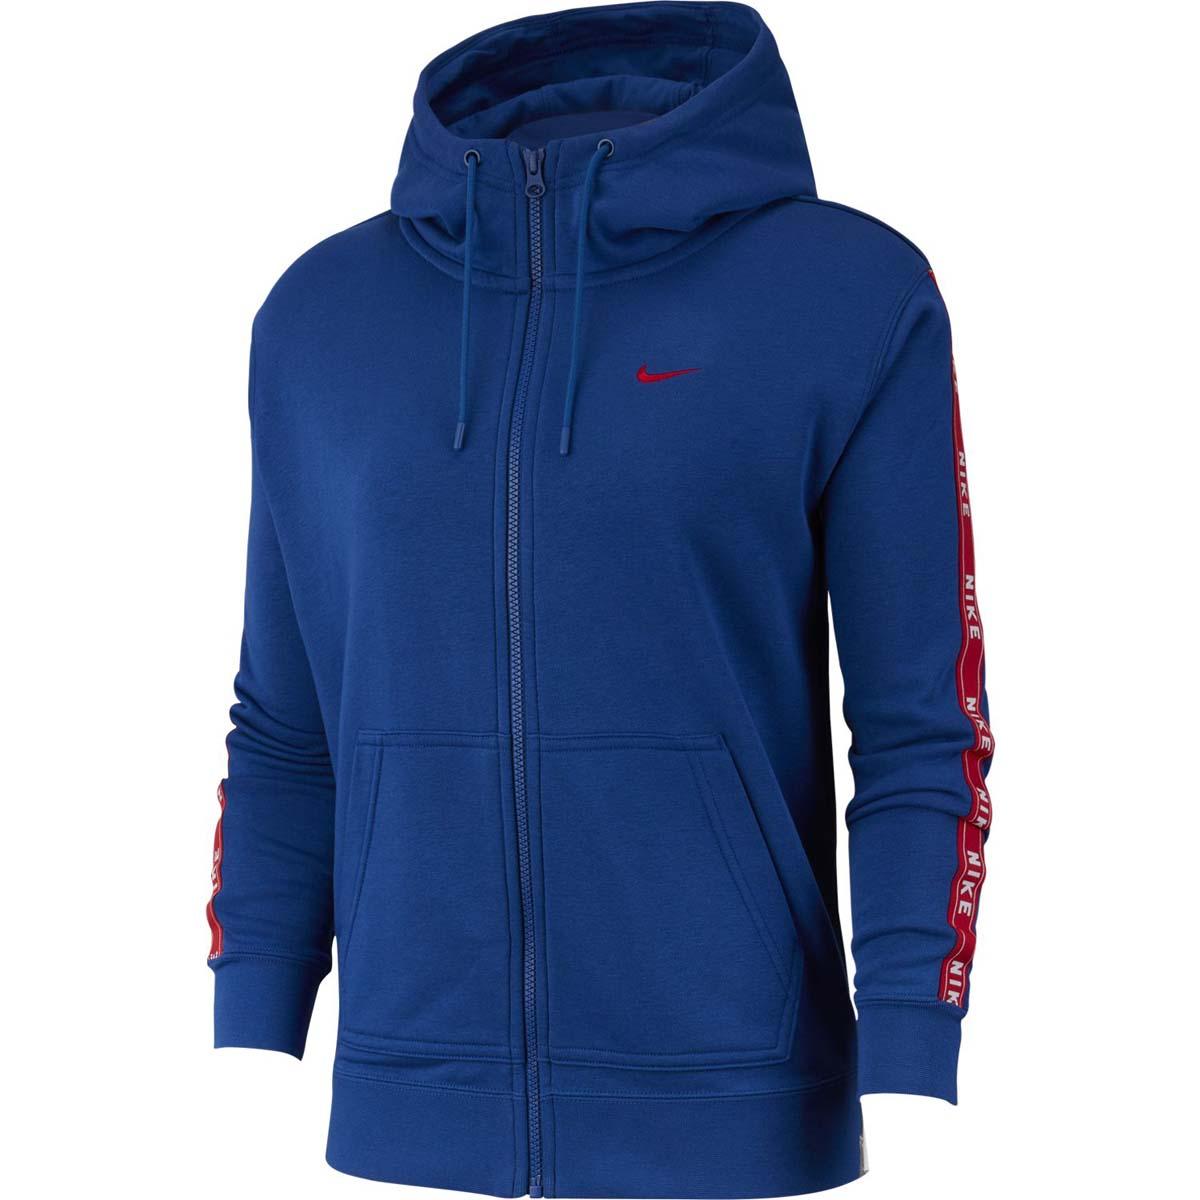 169cbd1ddc3 Voorvertoning: NIKE - FULL-ZIP LOGO sweater - blauw ...